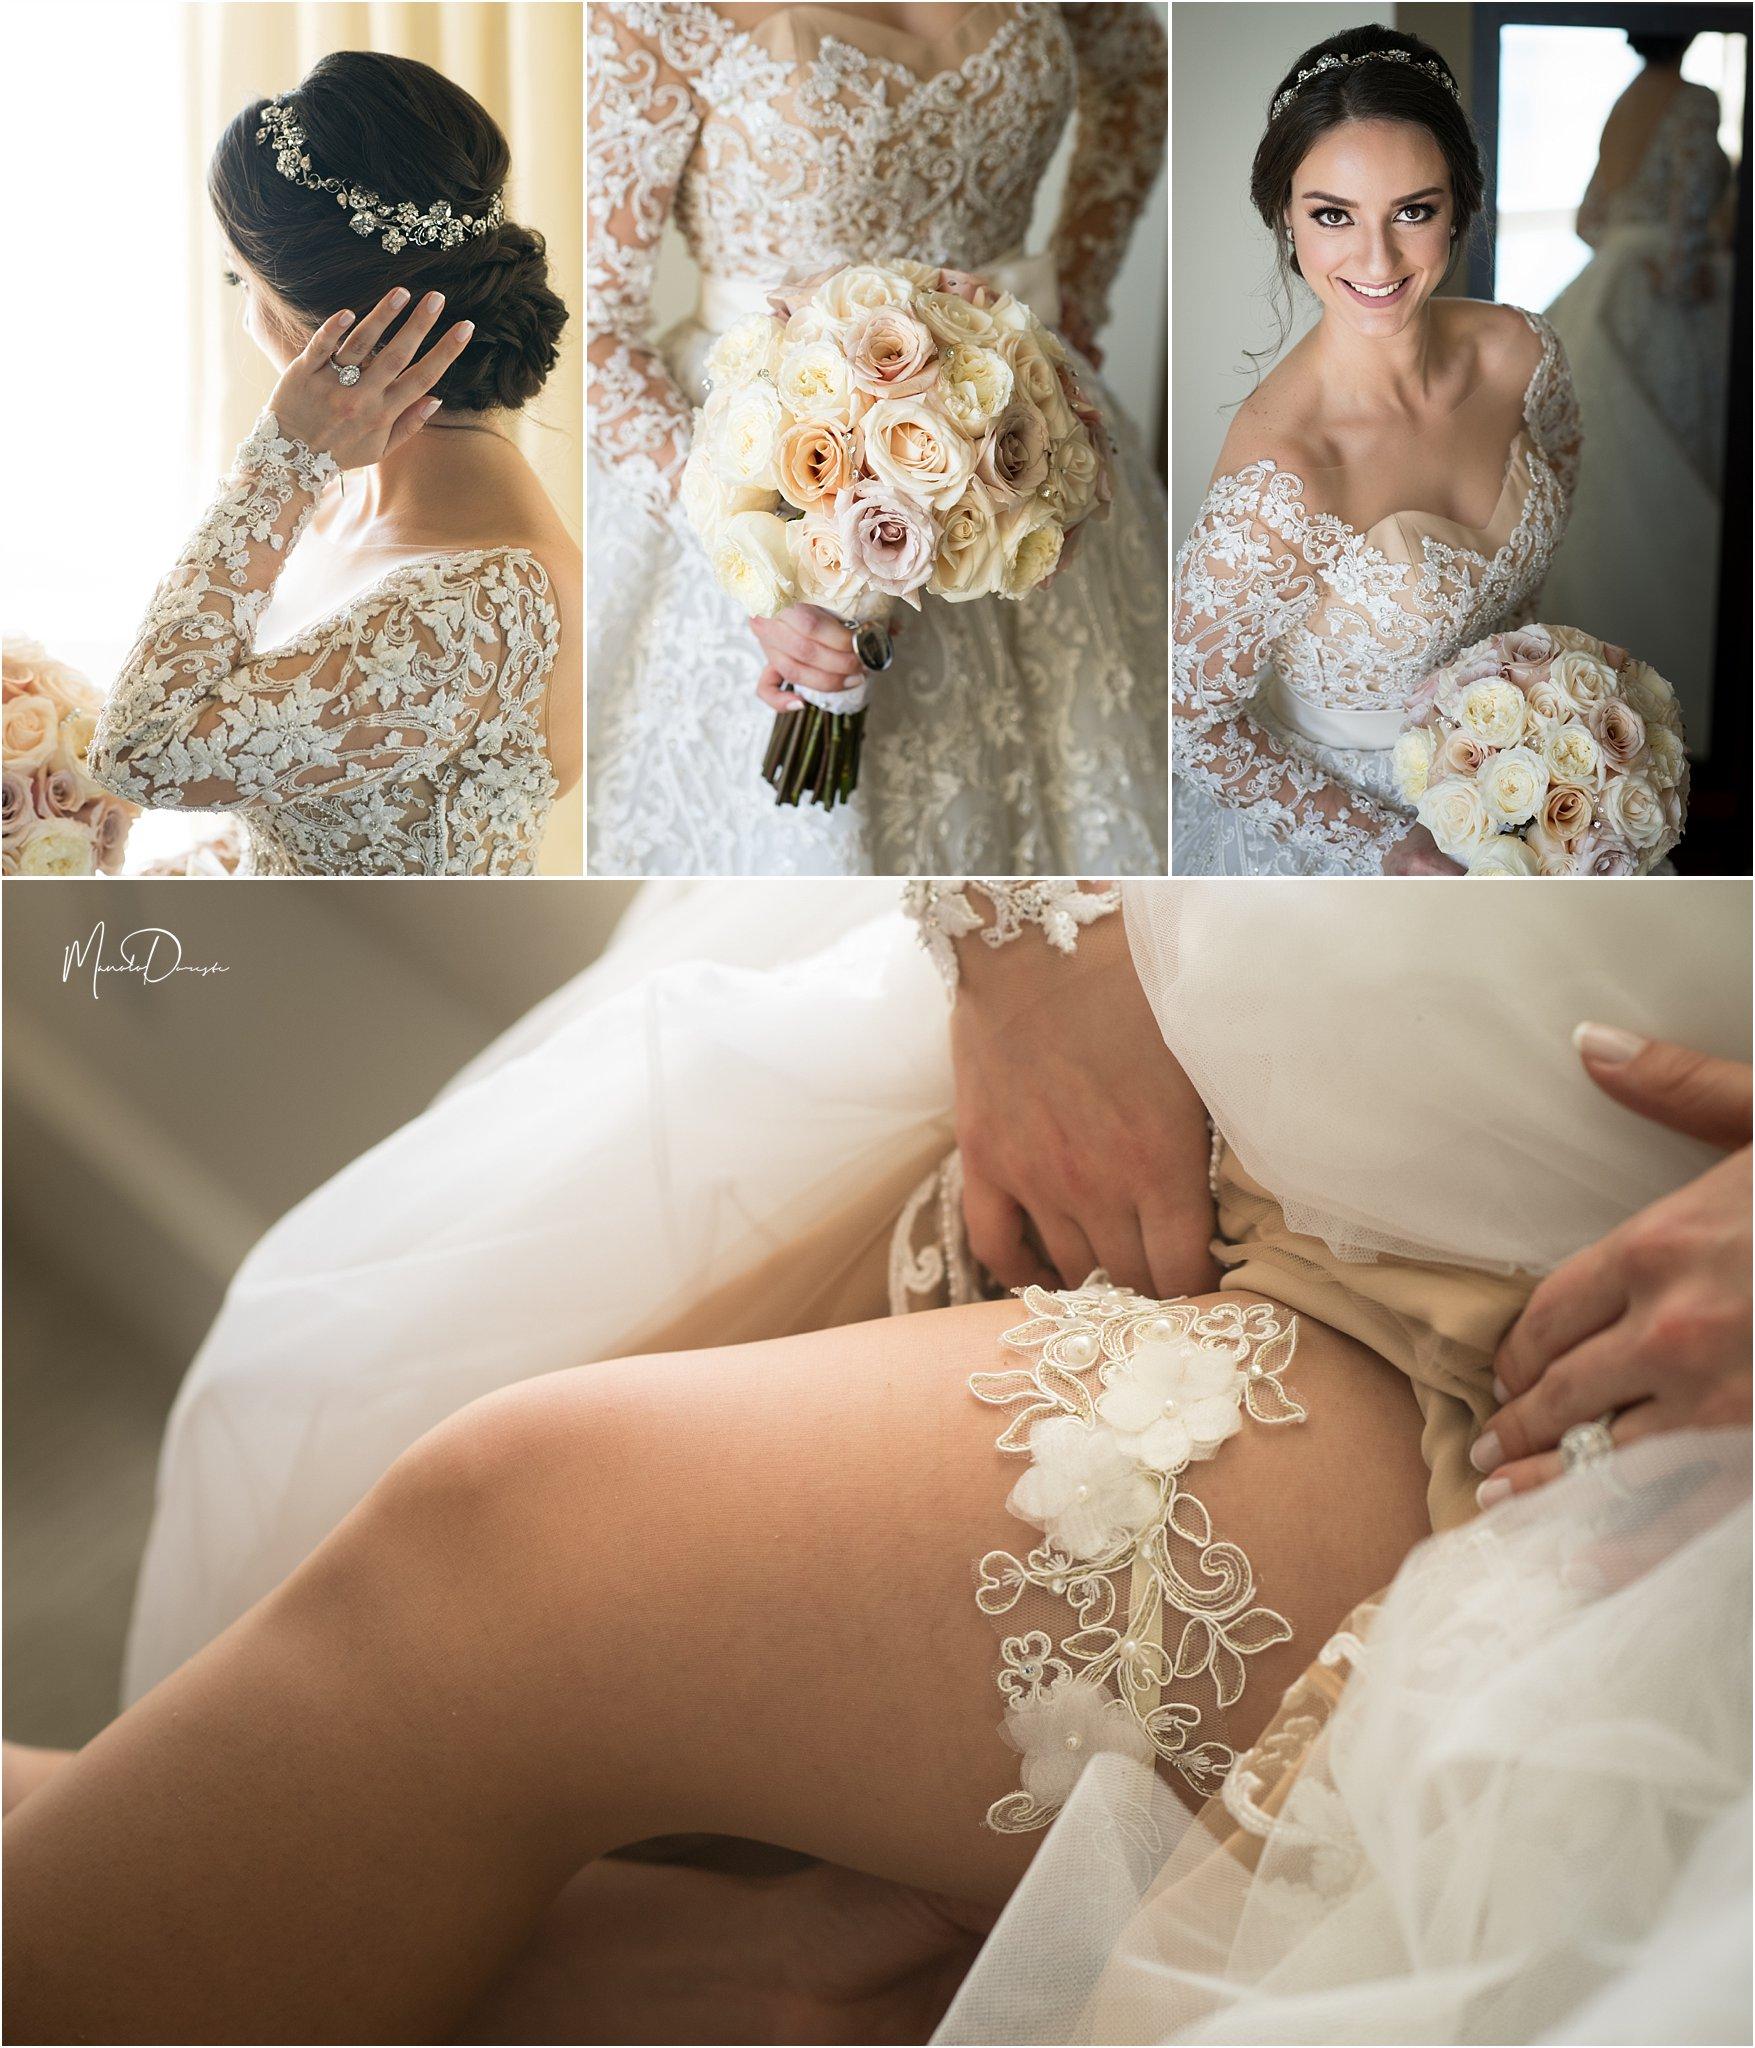 00712_ManoloDoreste_InFocusStudios_Wedding_Family_Photography_Miami_MiamiPhotographer.jpg